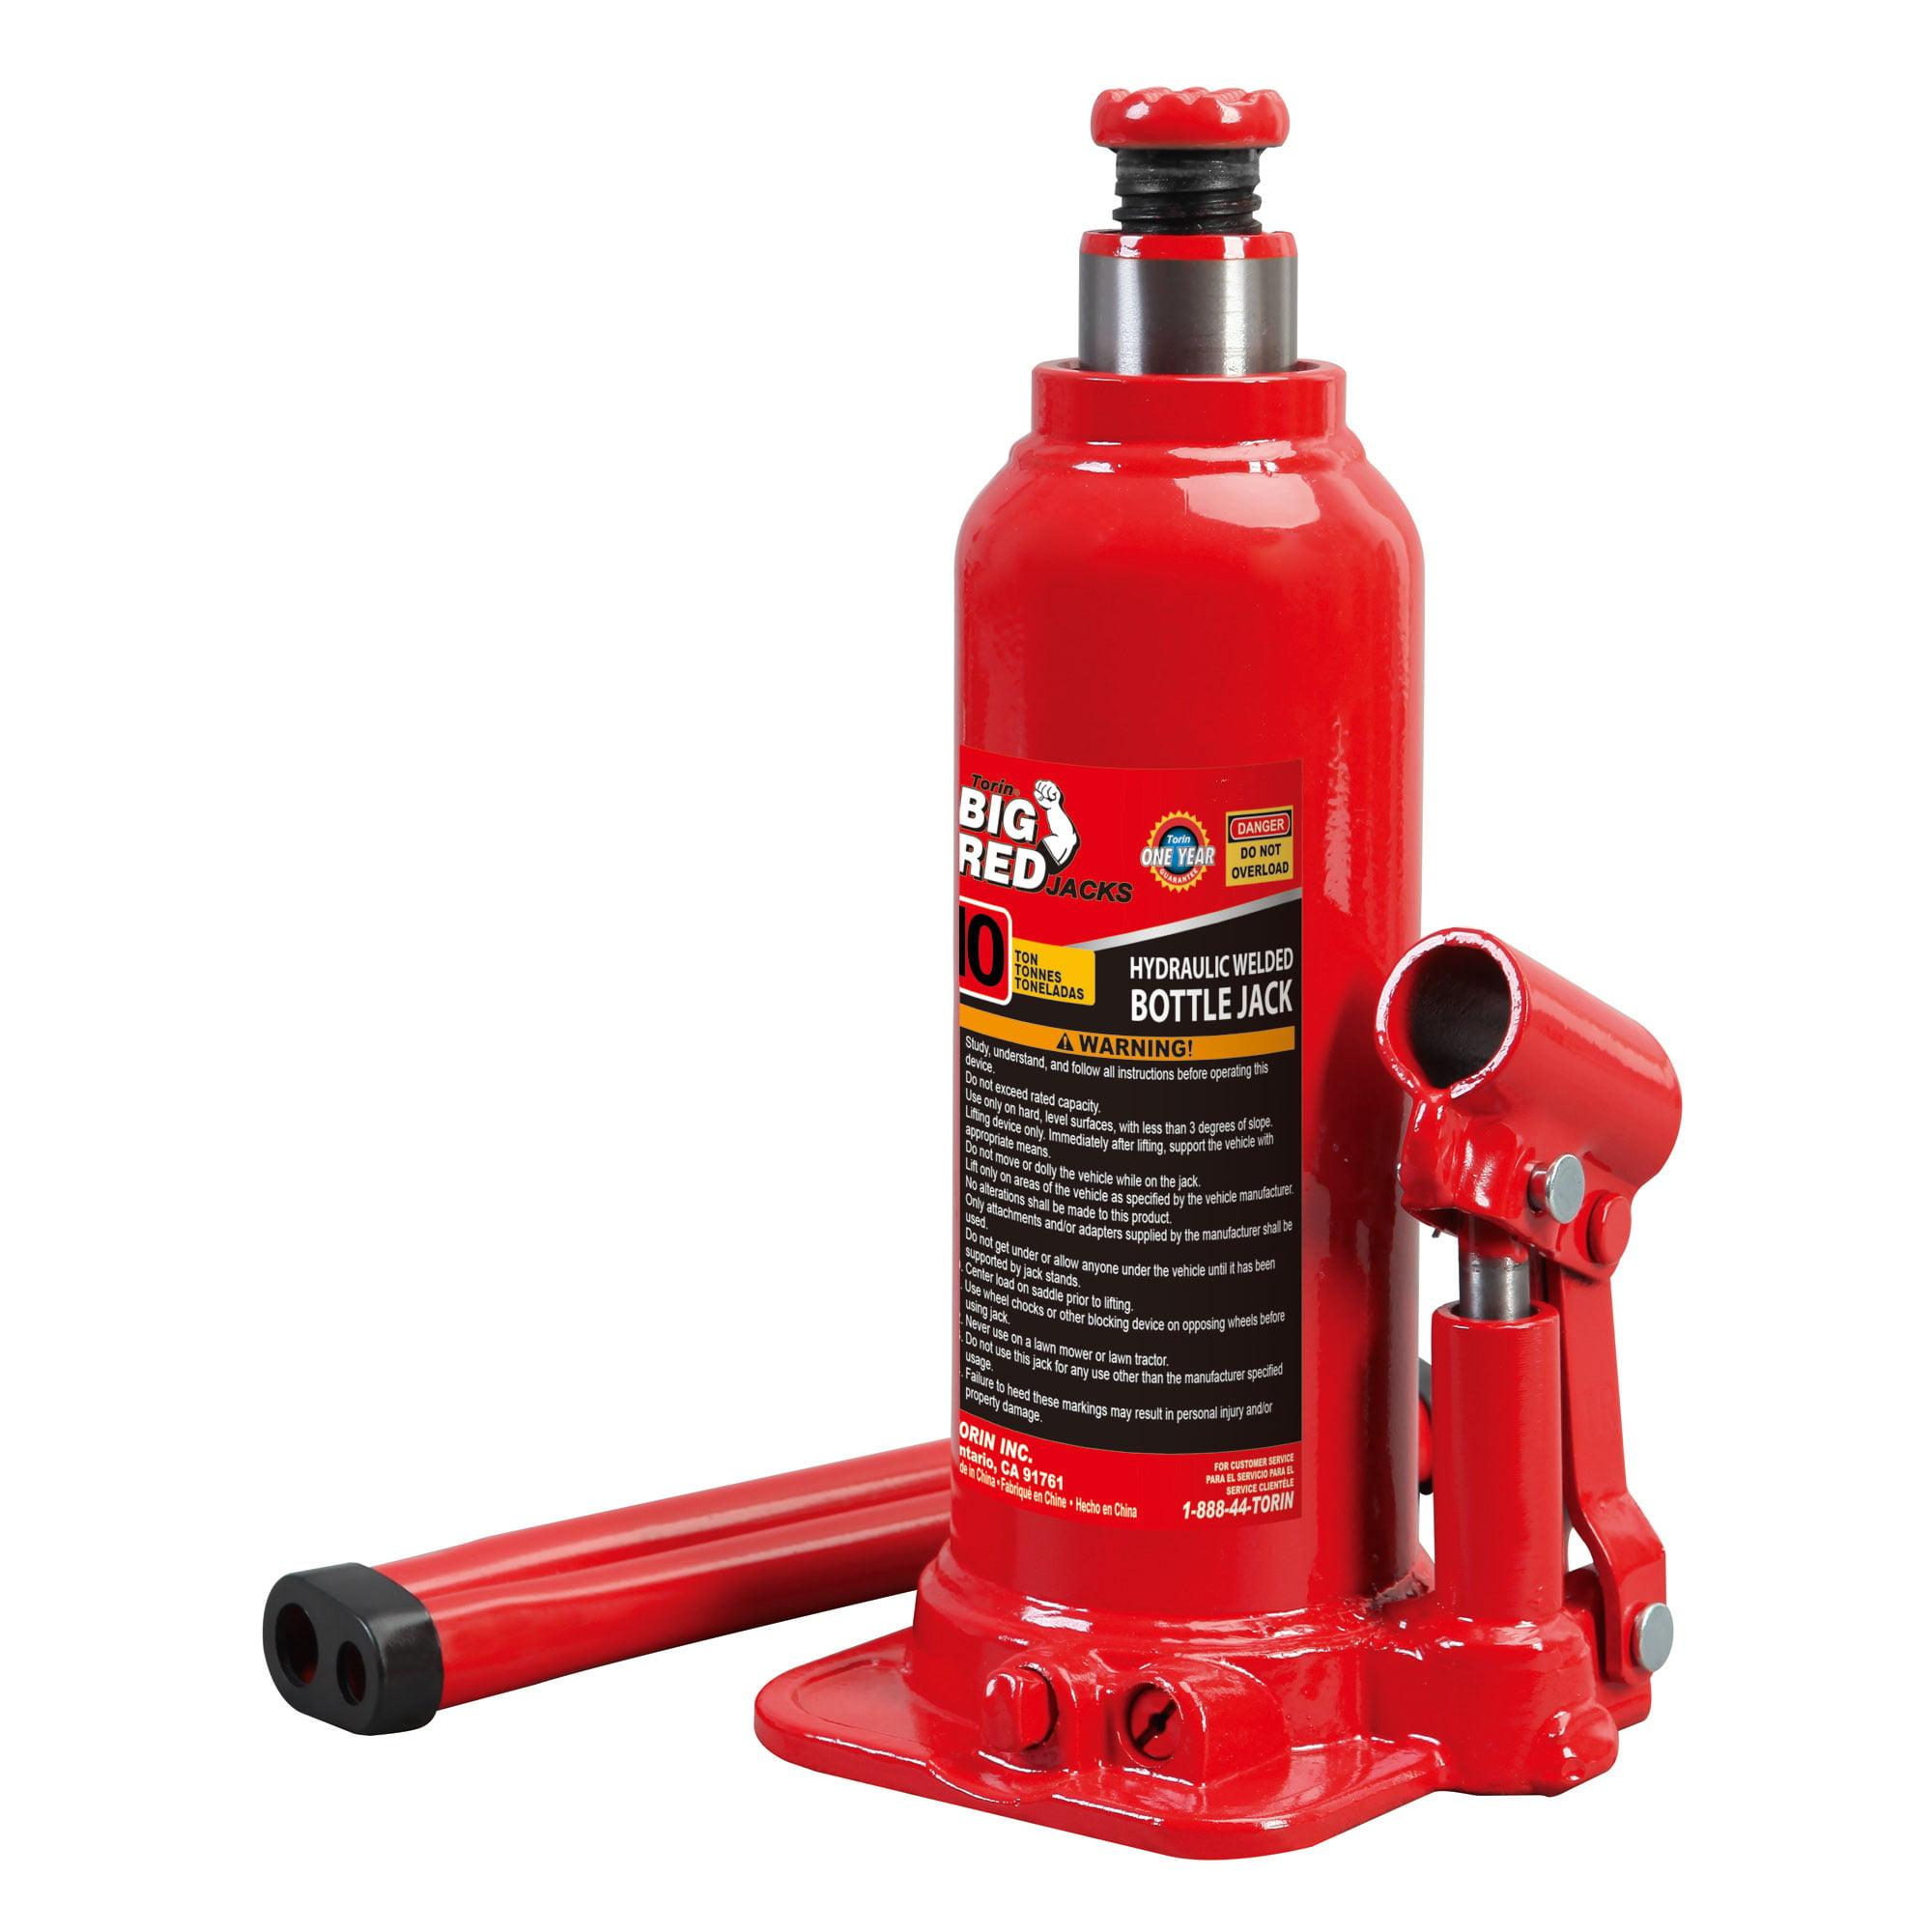 Torin Big Red T91003B 10 Ton Hydraulic Welded Auto Mechanic Bottle Jack Lift